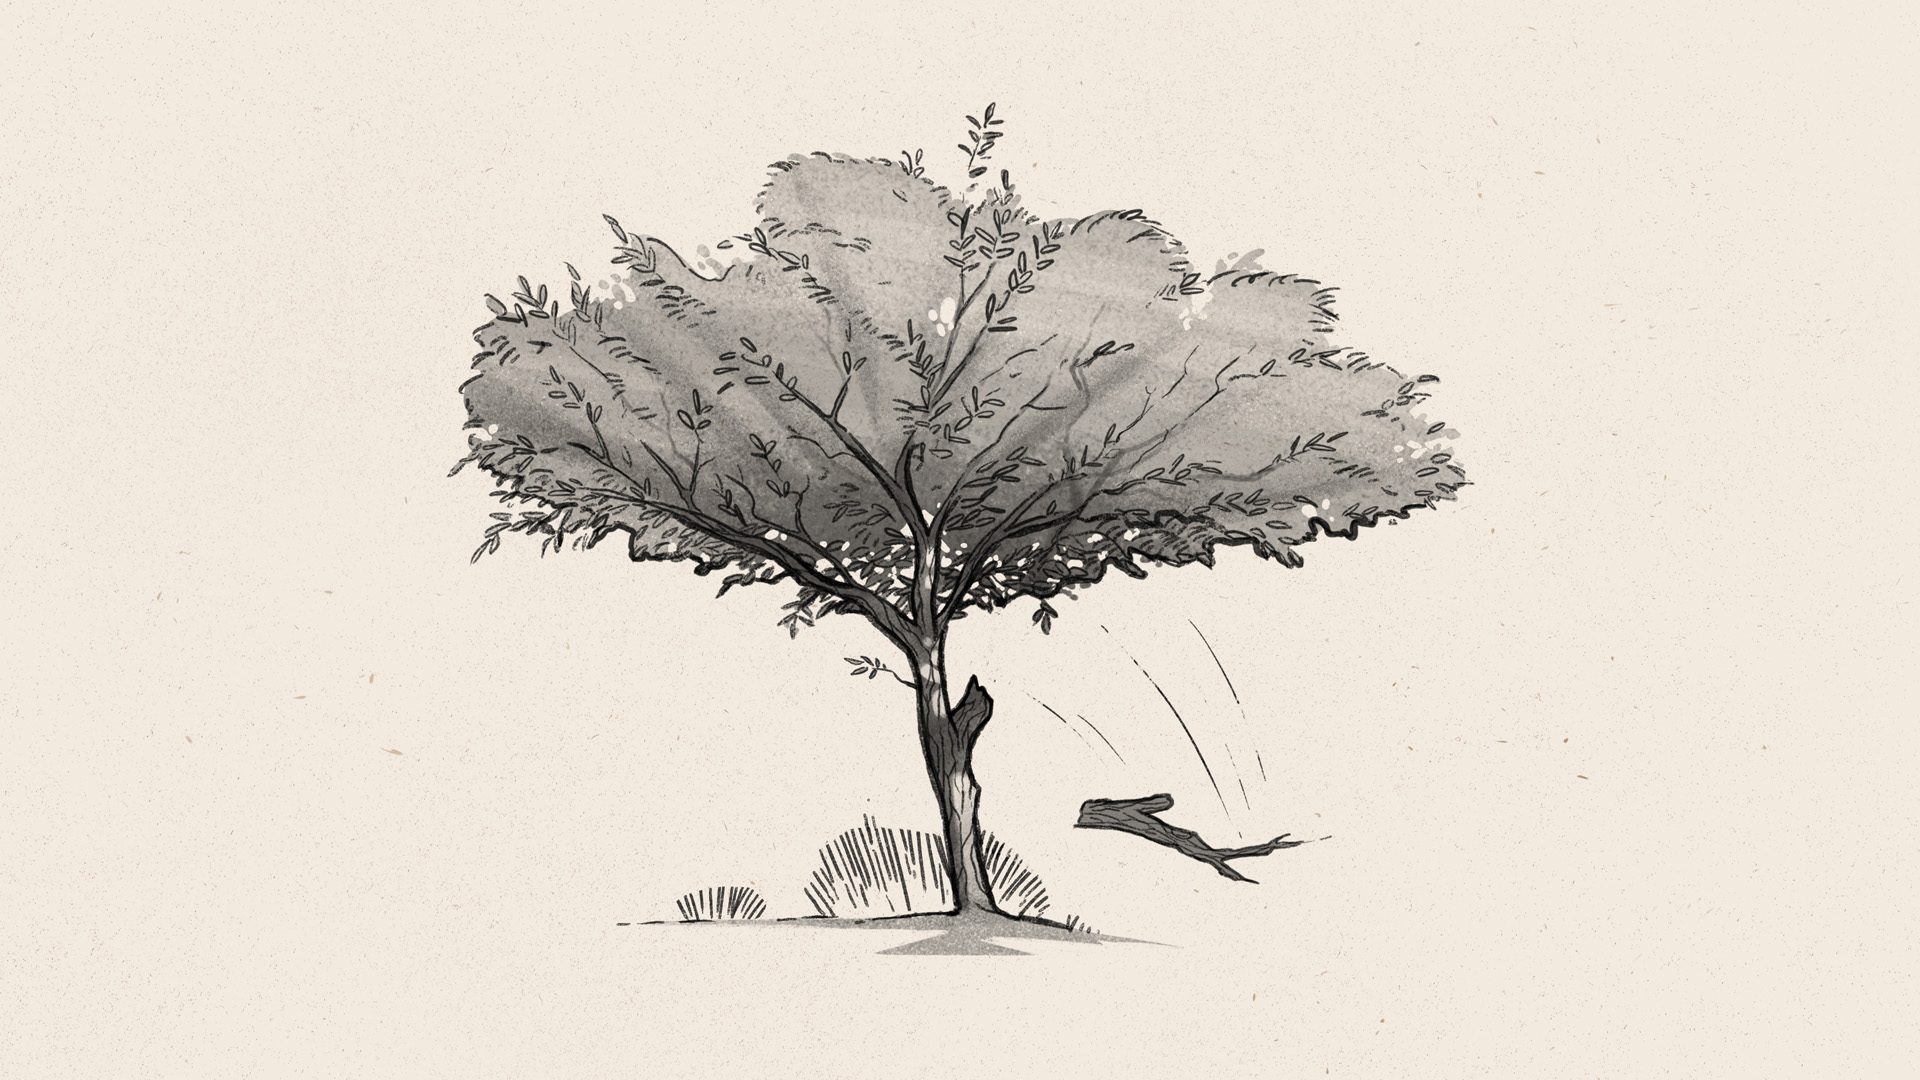 LB_06_TREE_BRANCHFALLING